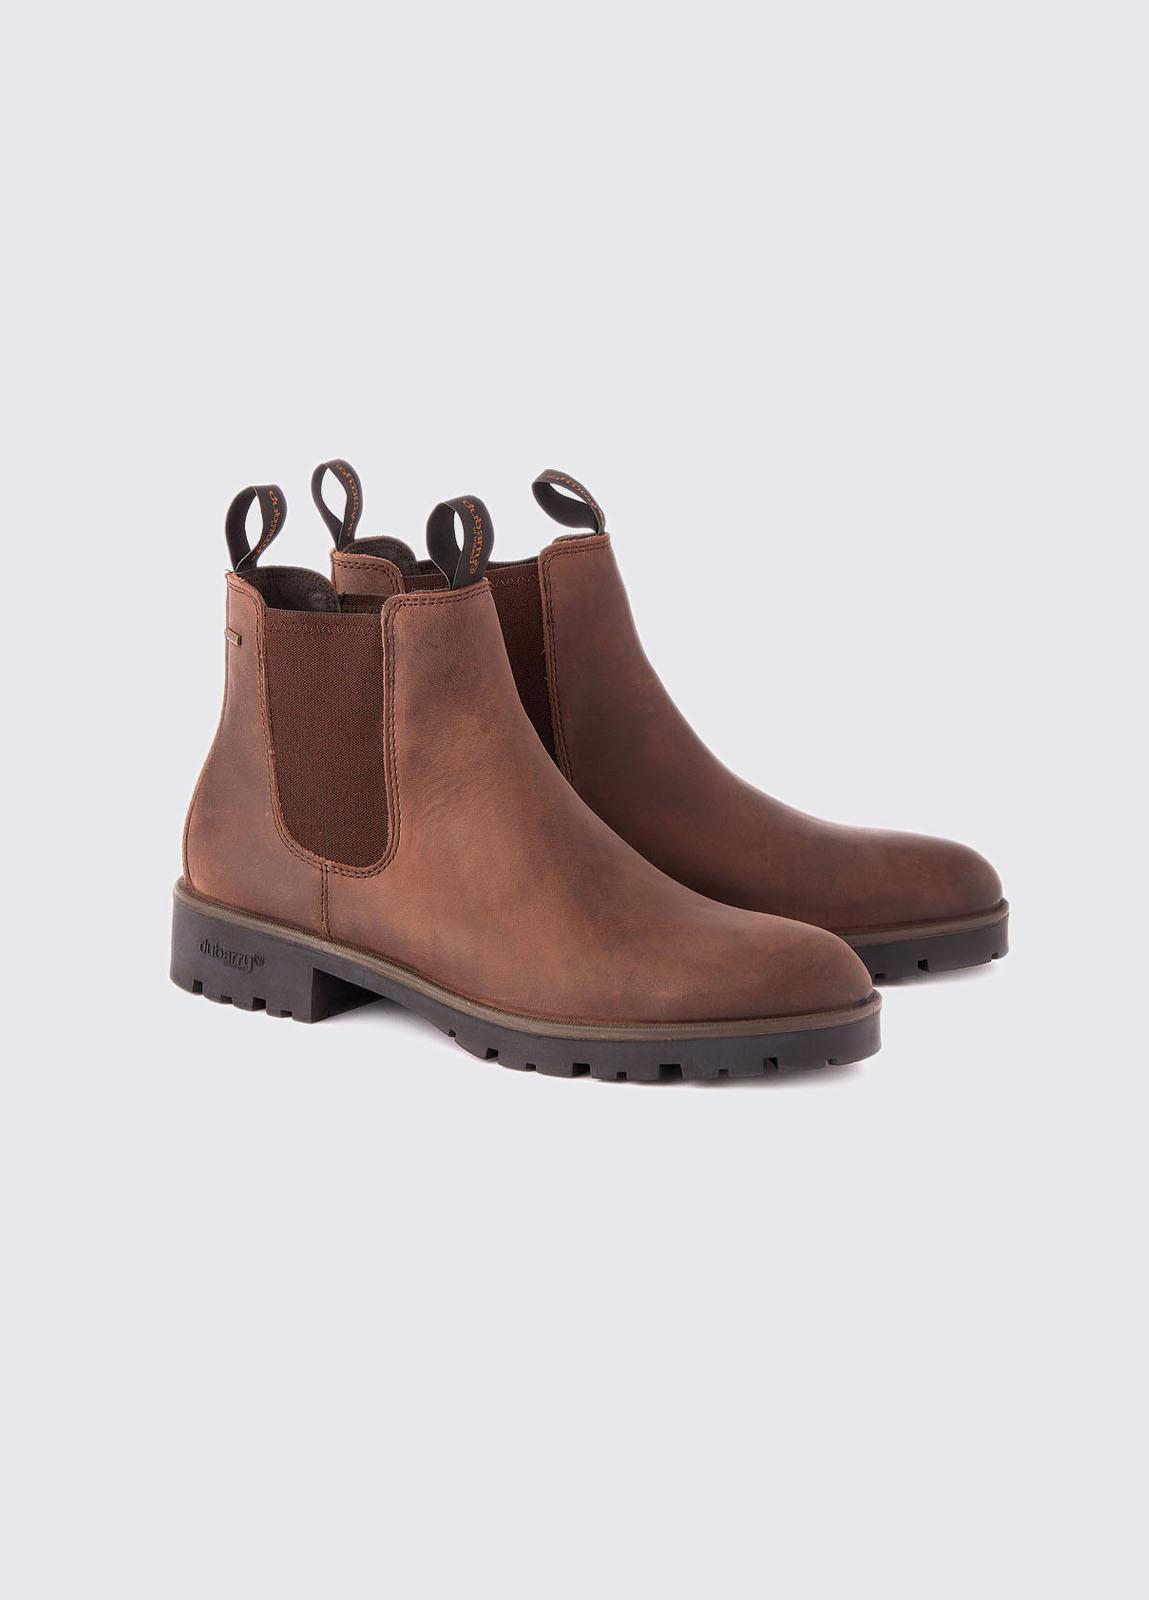 Antrim Country Boot - Bourbon